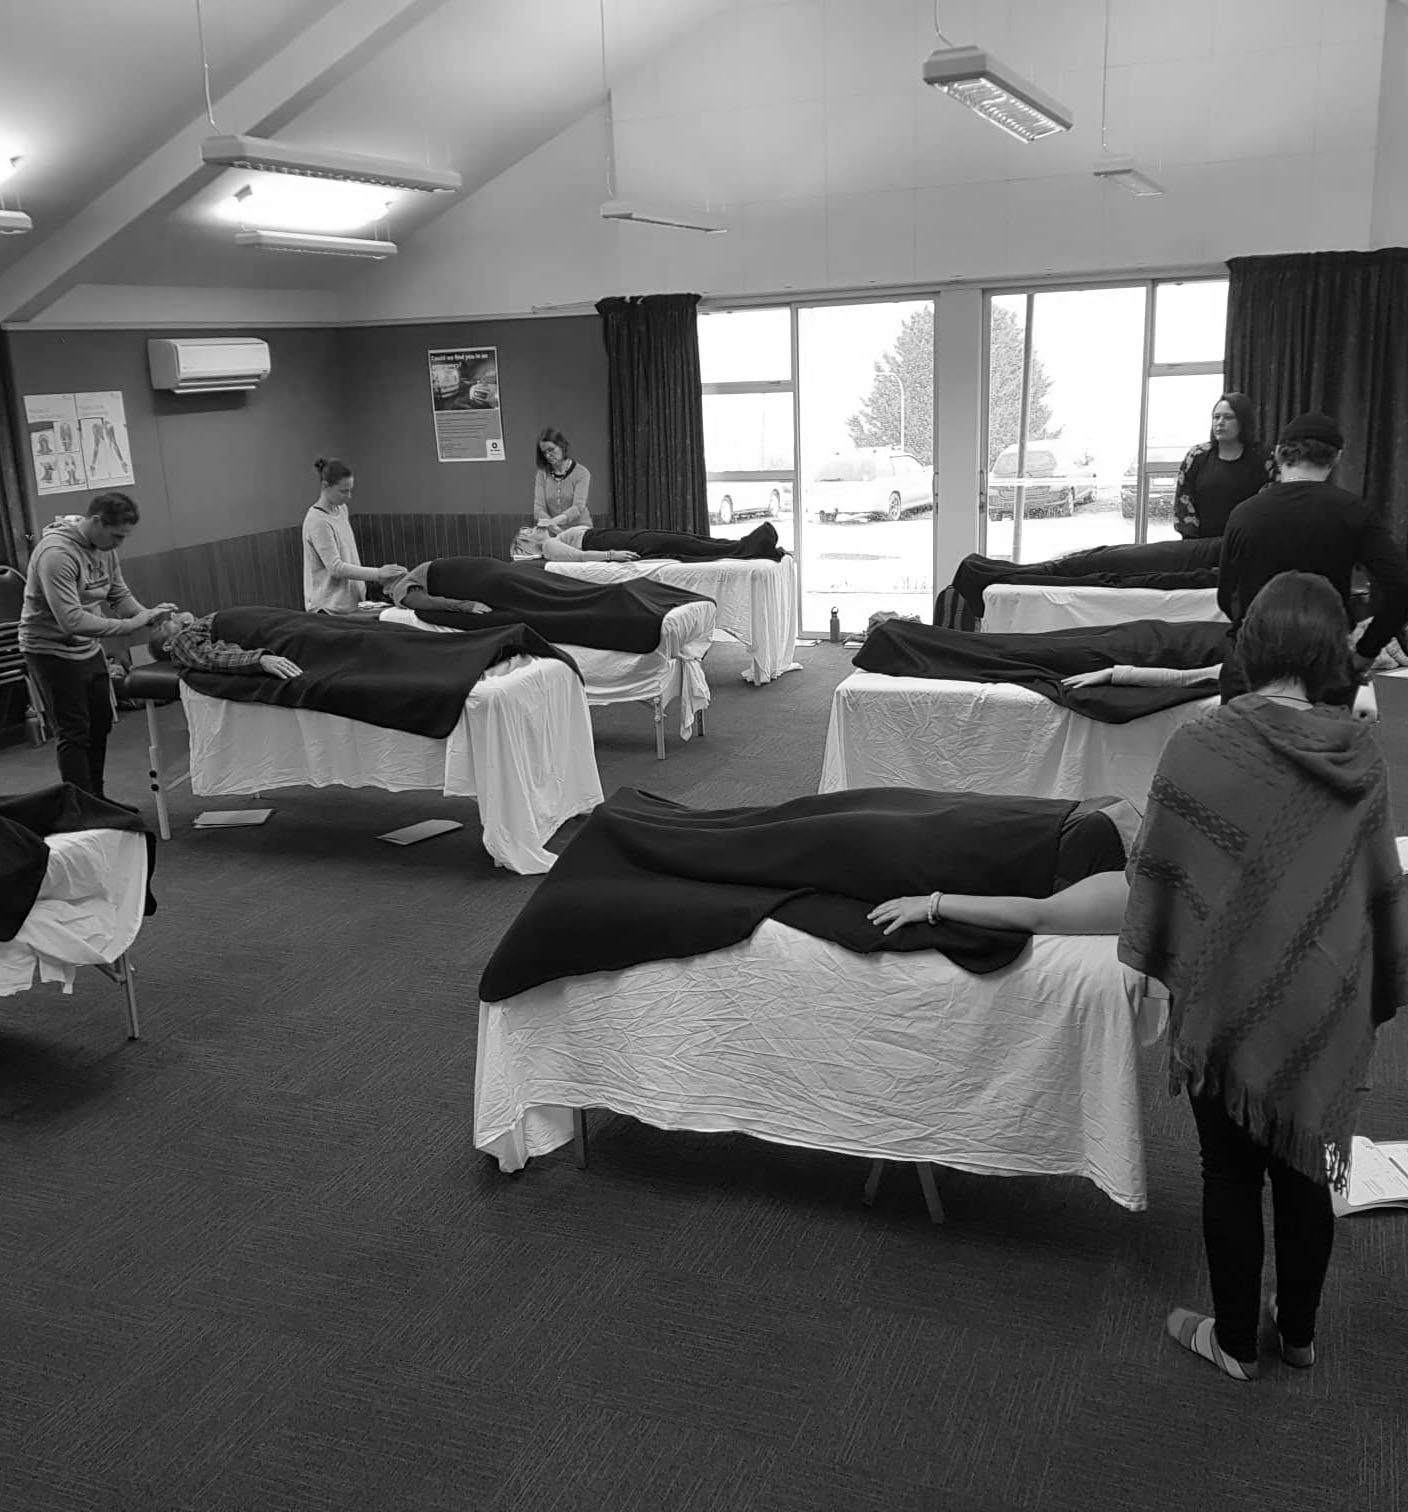 Healing aotearoa workshops image.jpg